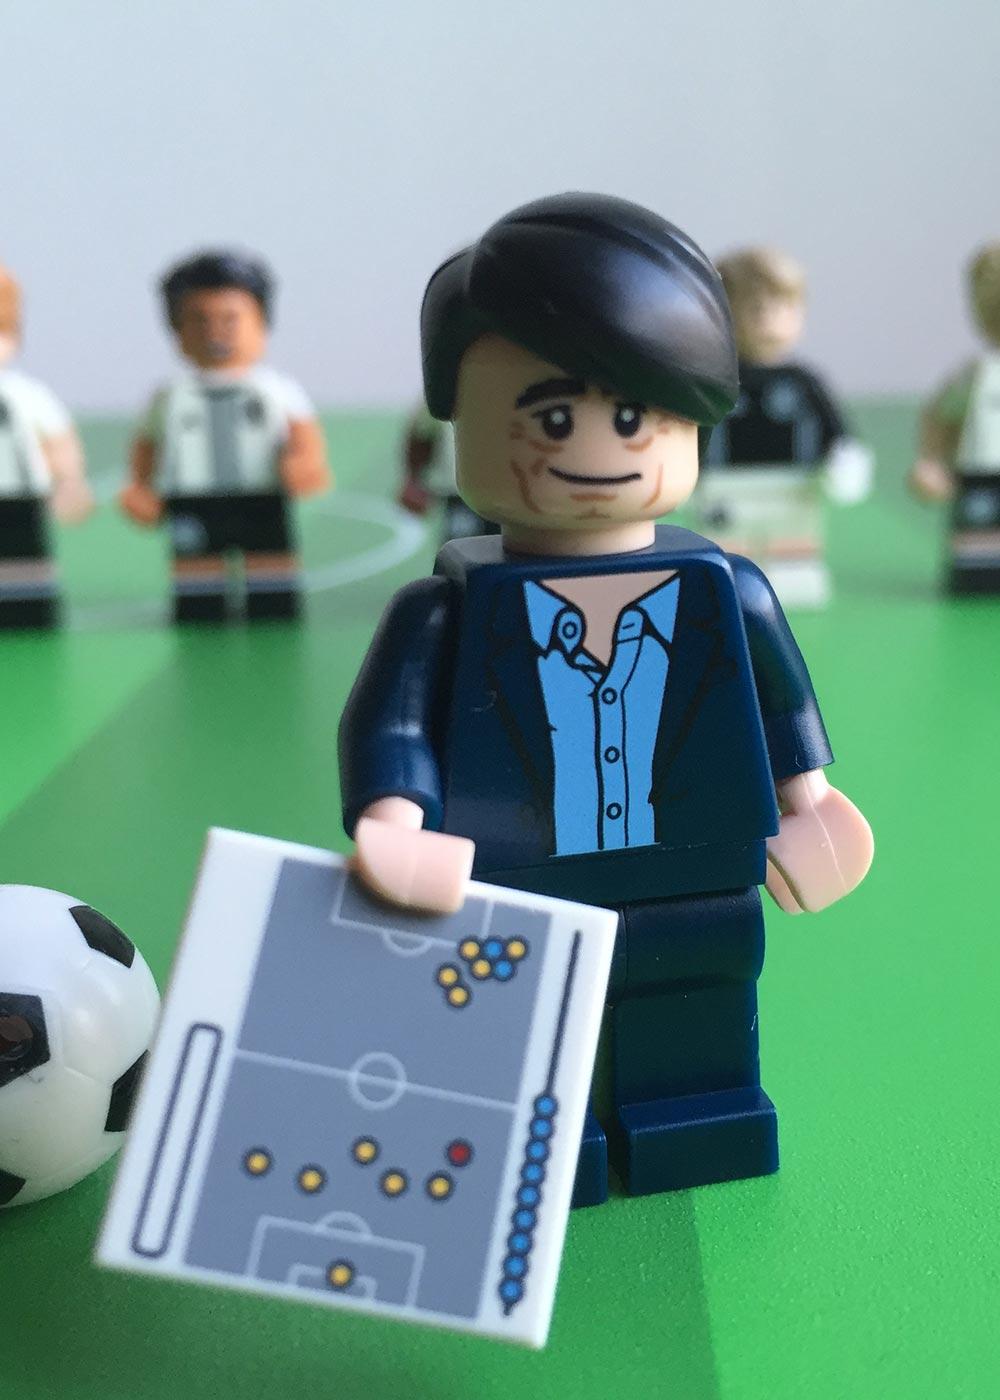 Ikea Smastad Bank Fussballfeld grün Teilansicht Schiri